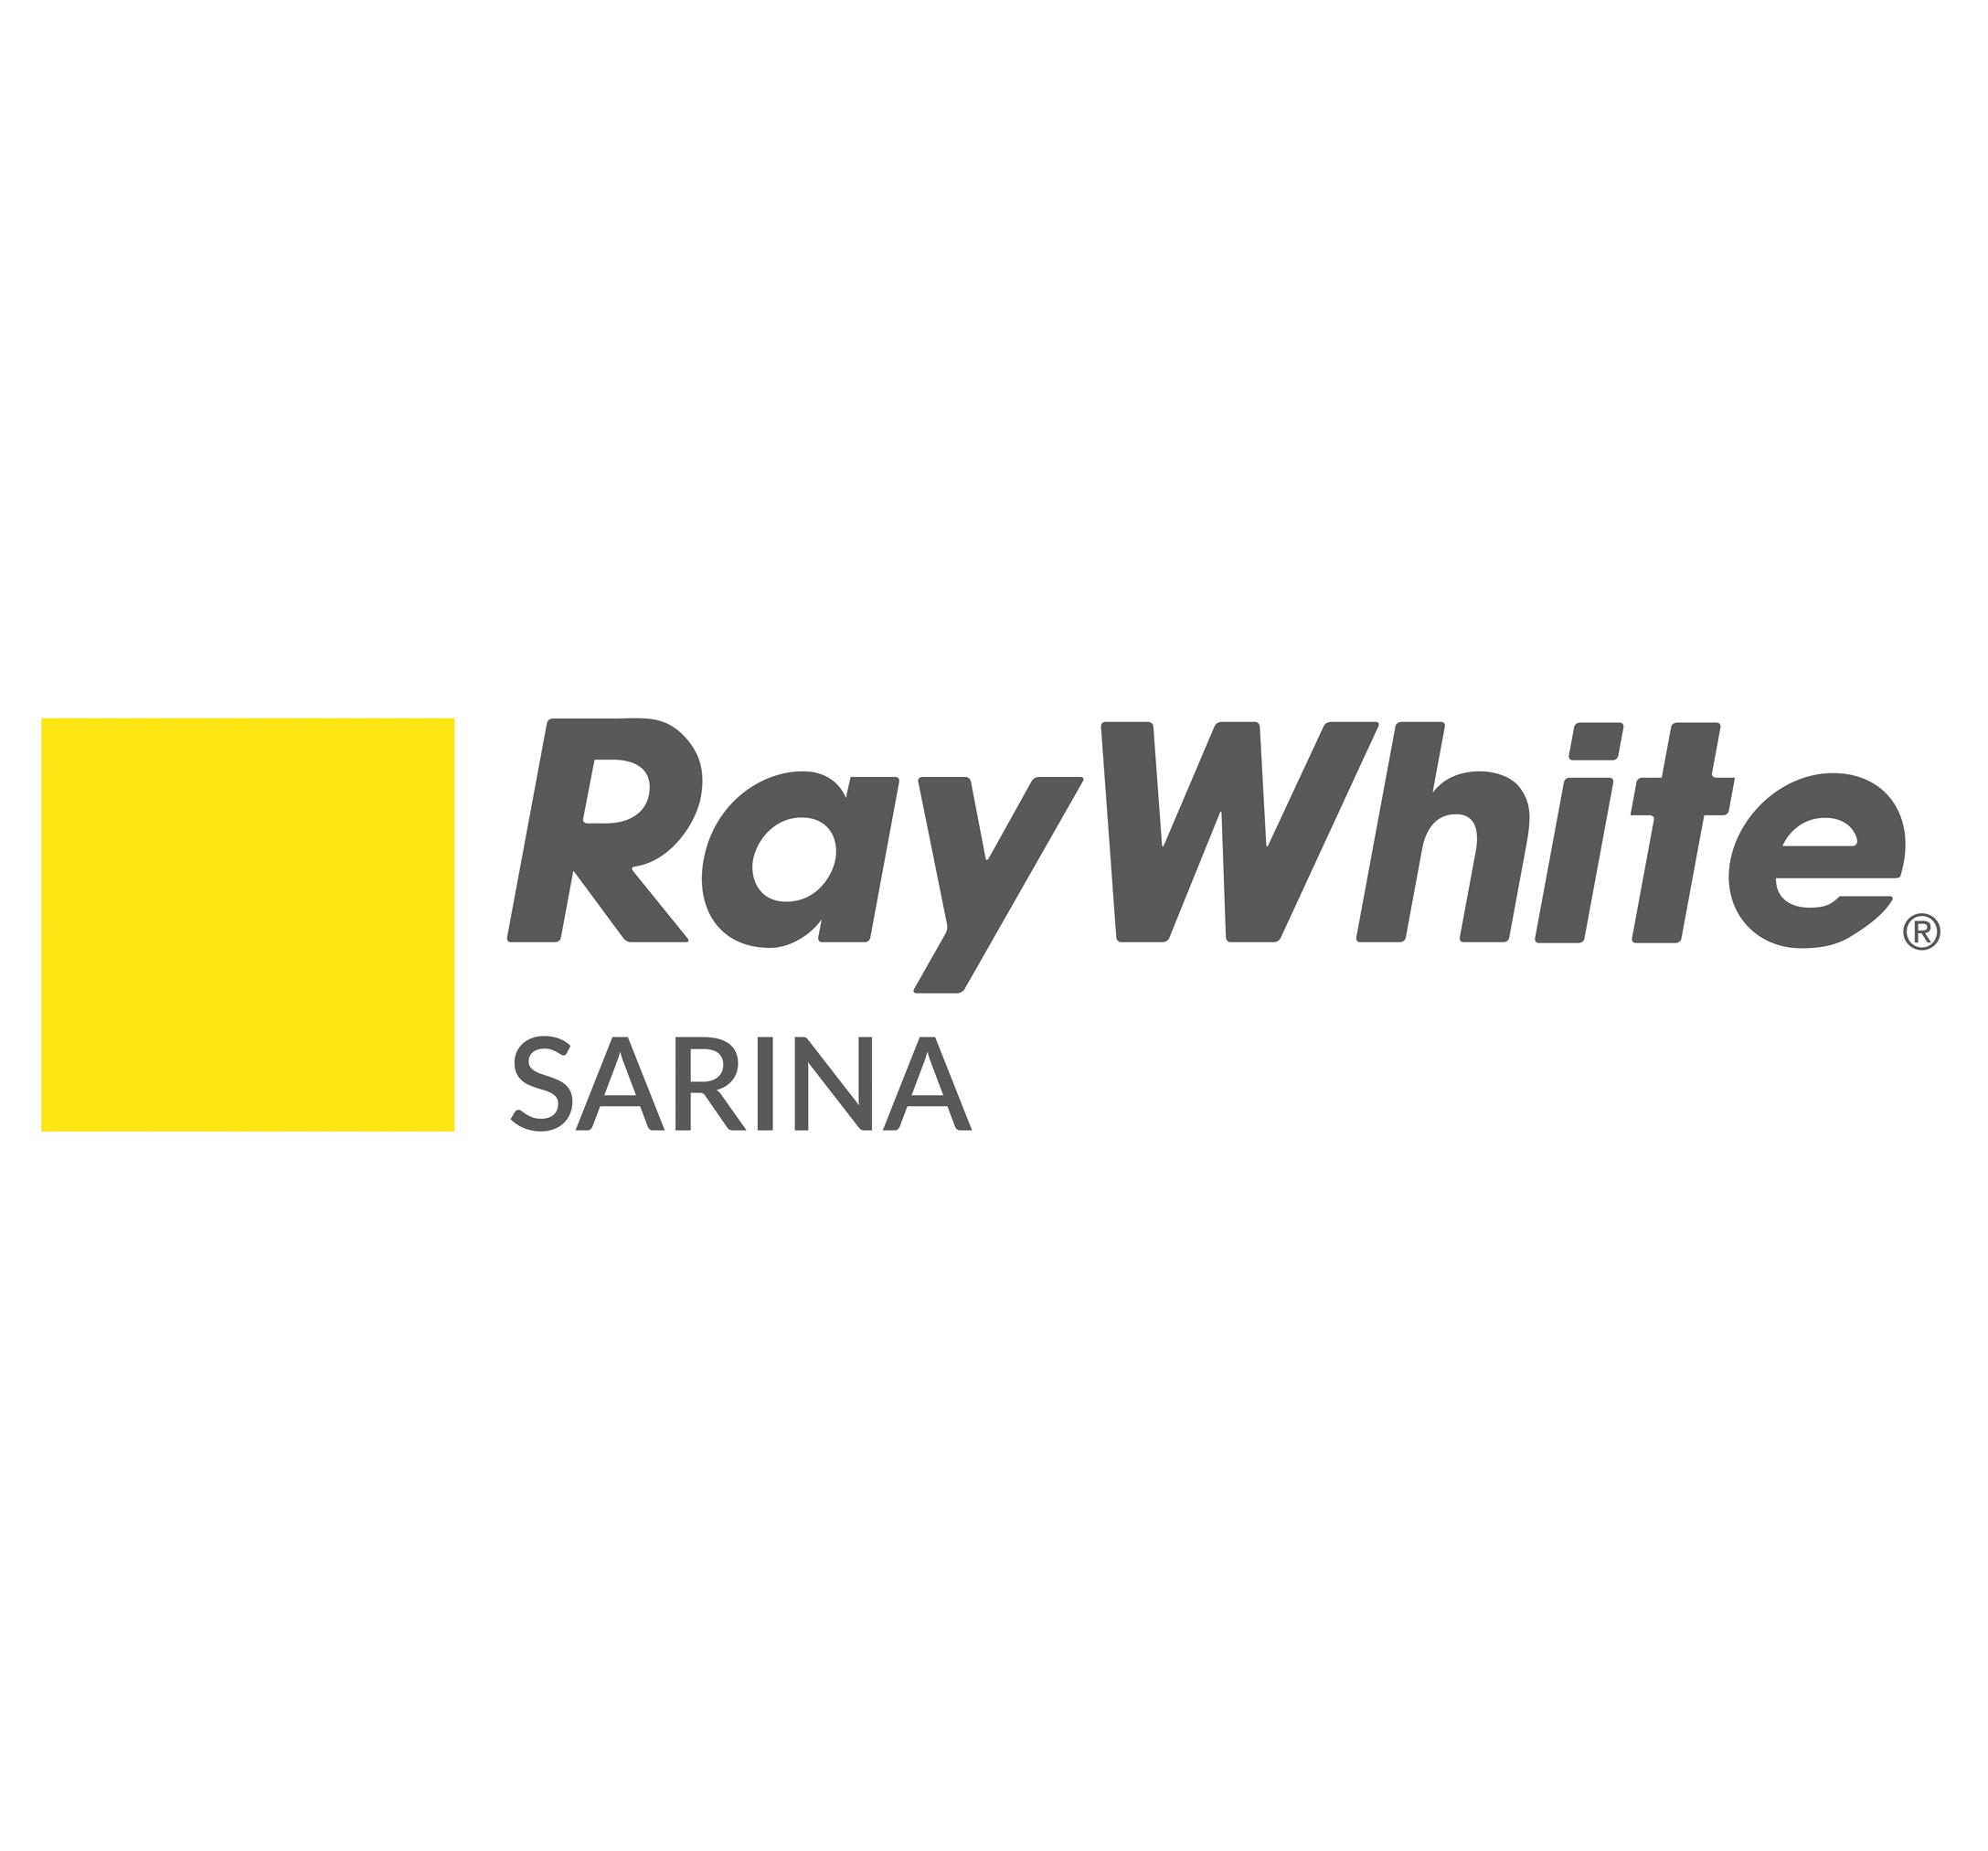 Ray White SARINA